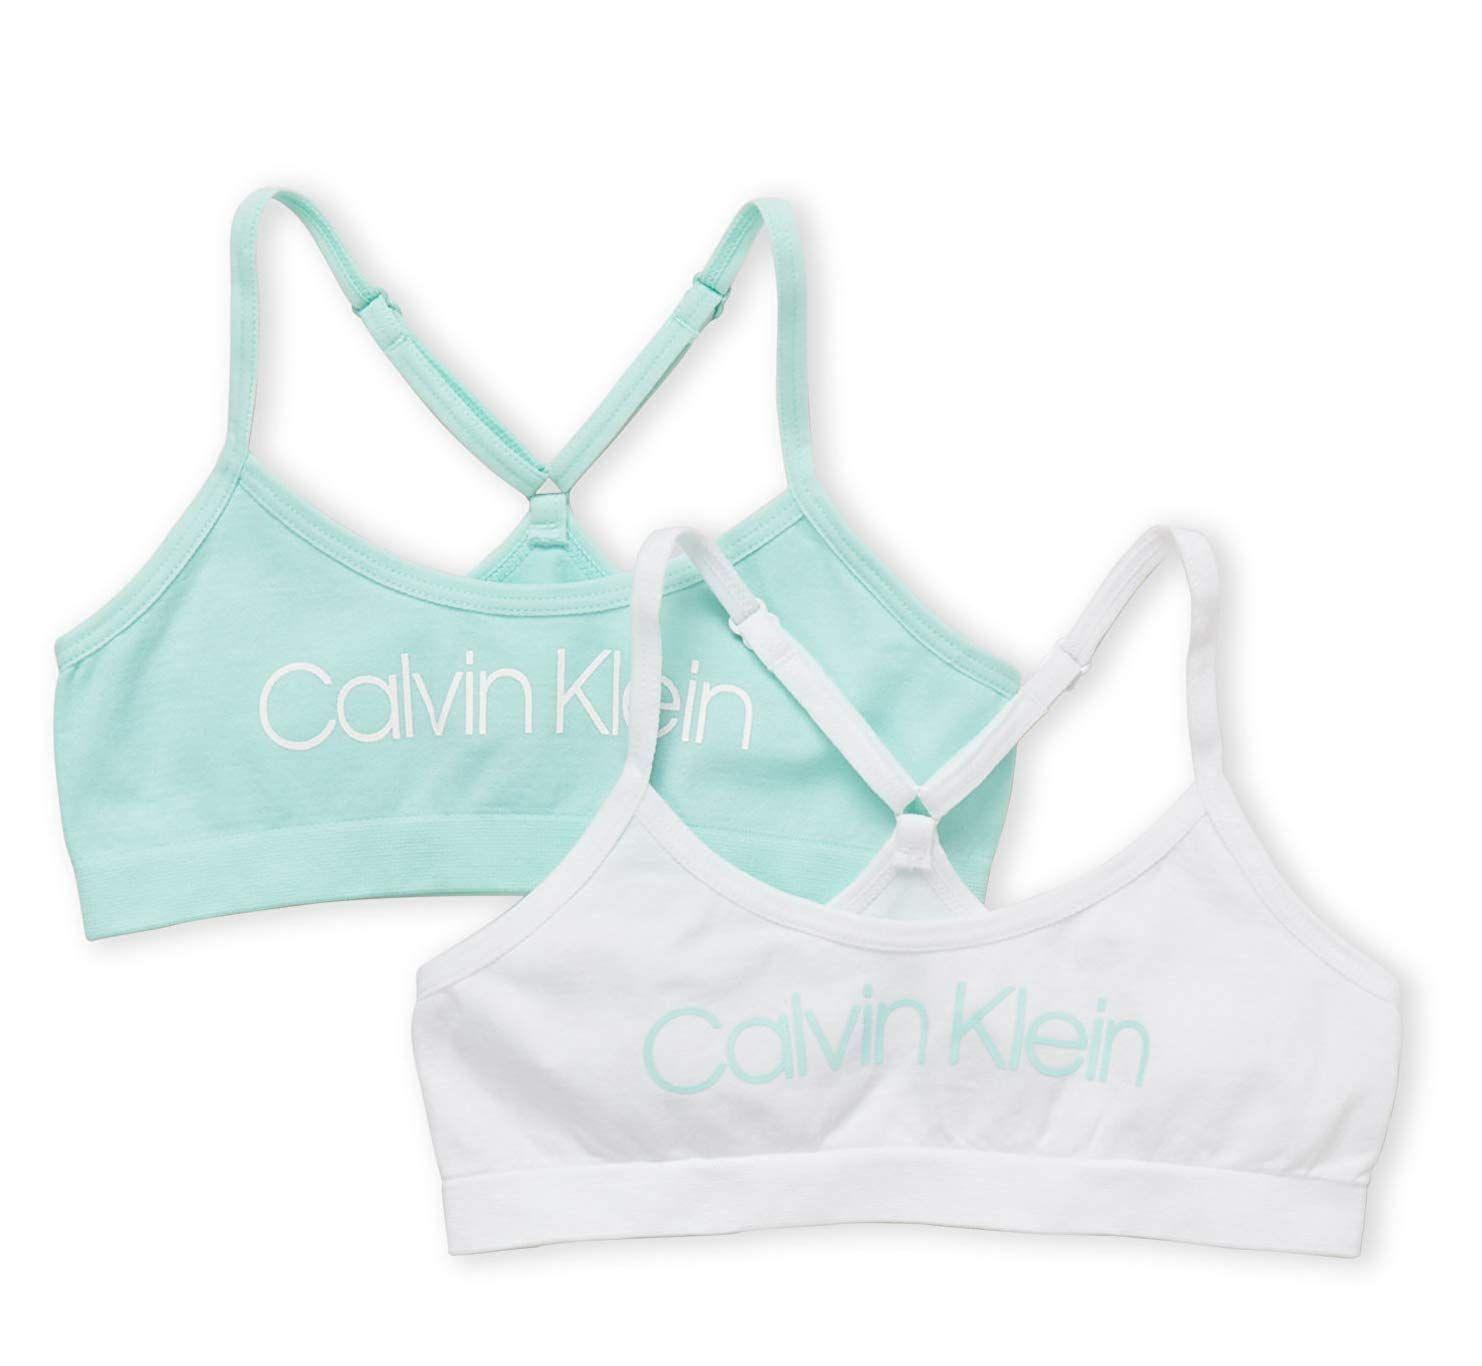 618ea3f3e2 Calvin Klein Big Girls  Seamless Racerback Crop Bra (Pack of 2 ...